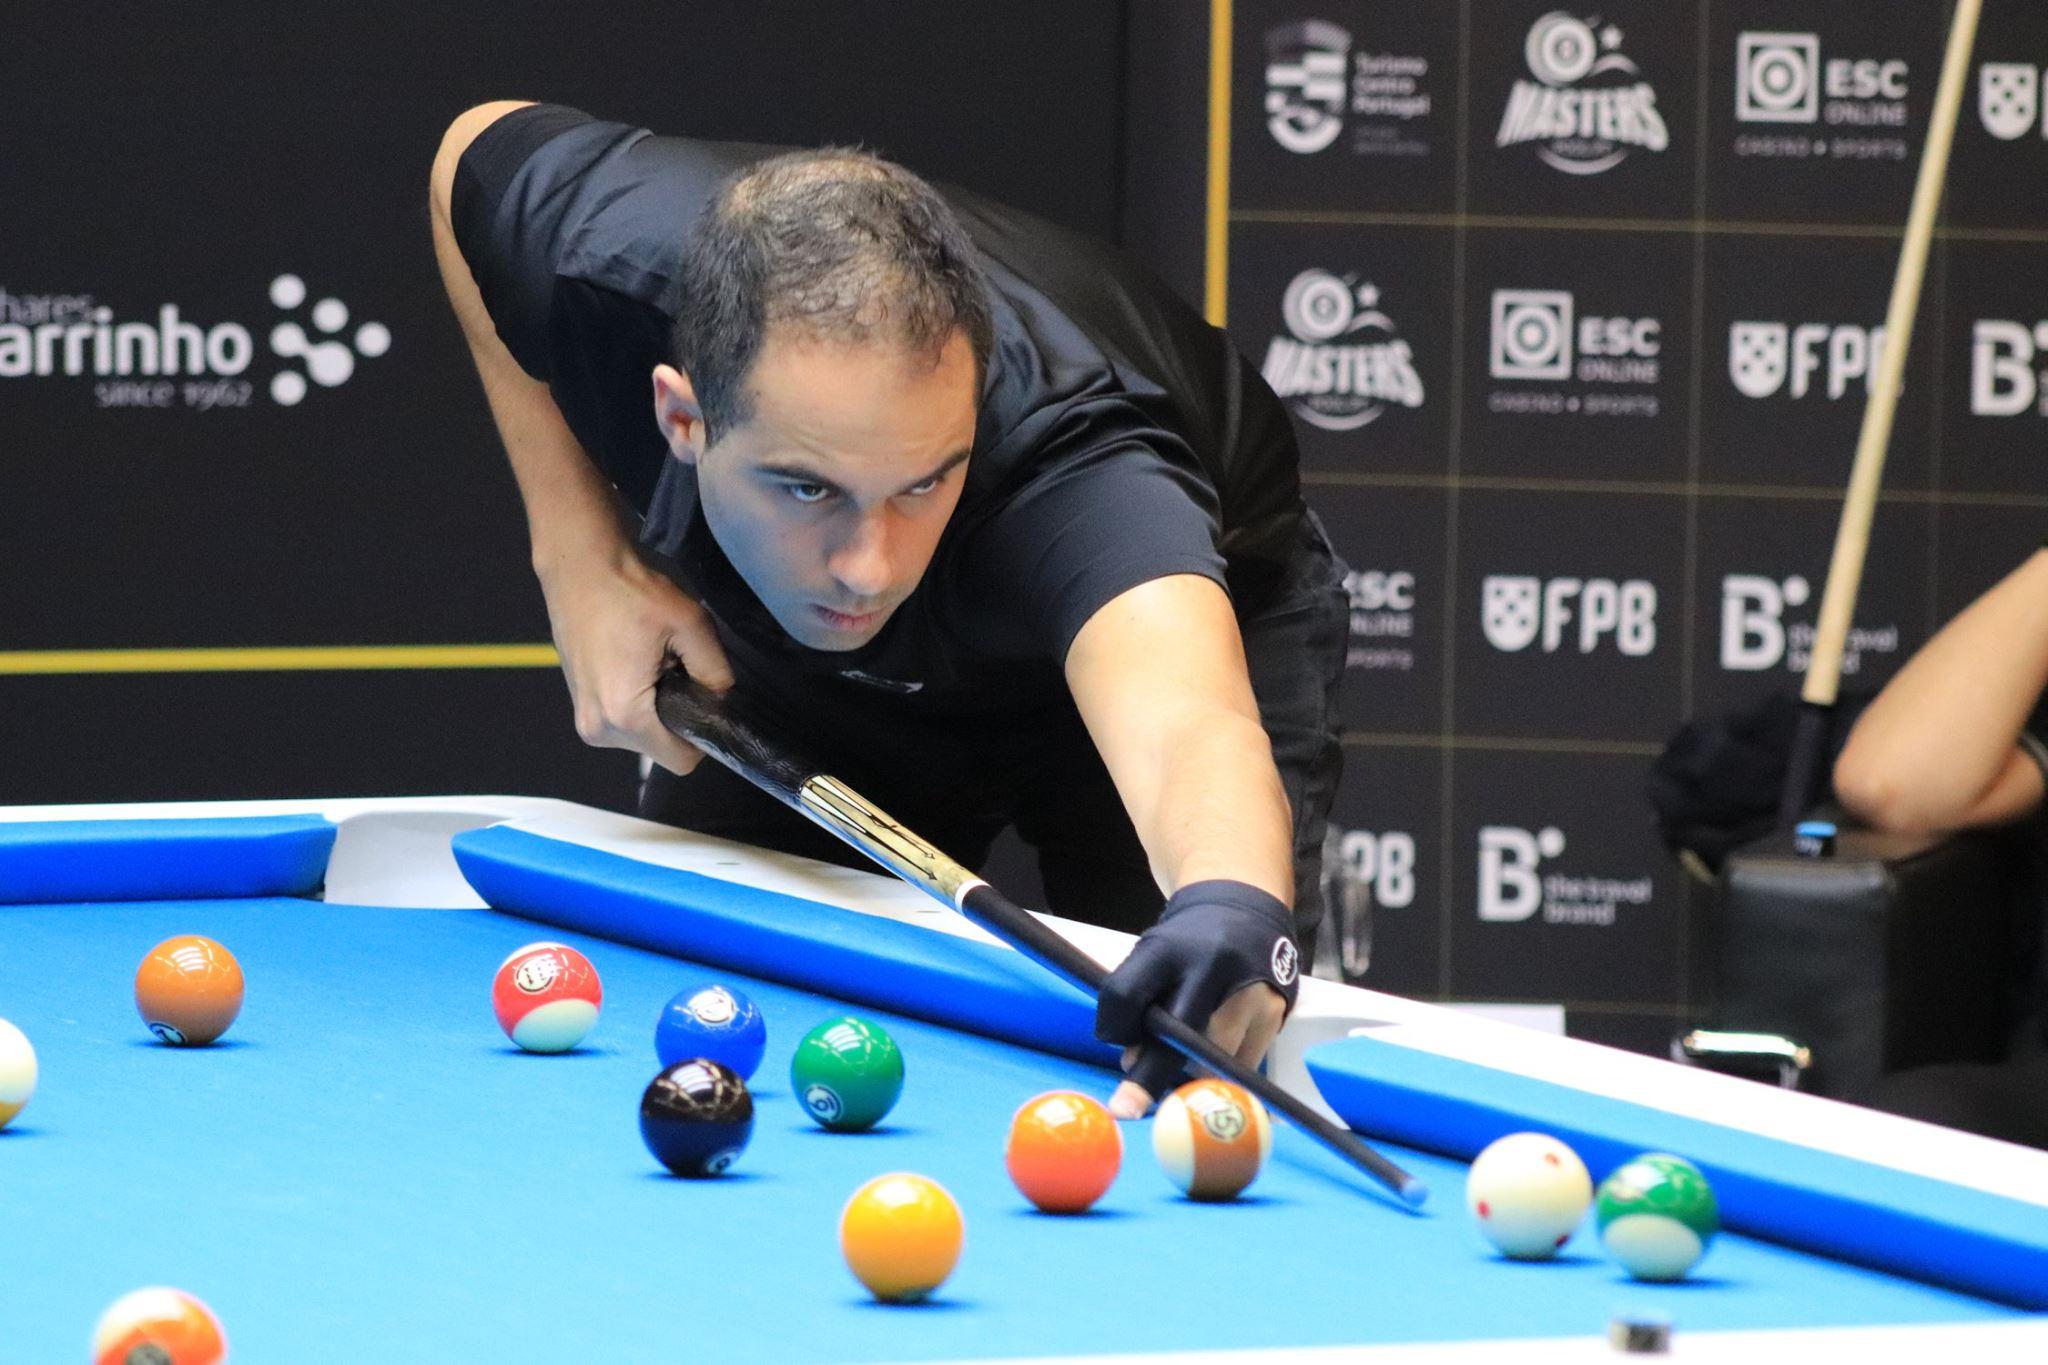 7º Esc. Online Masters Pool PT